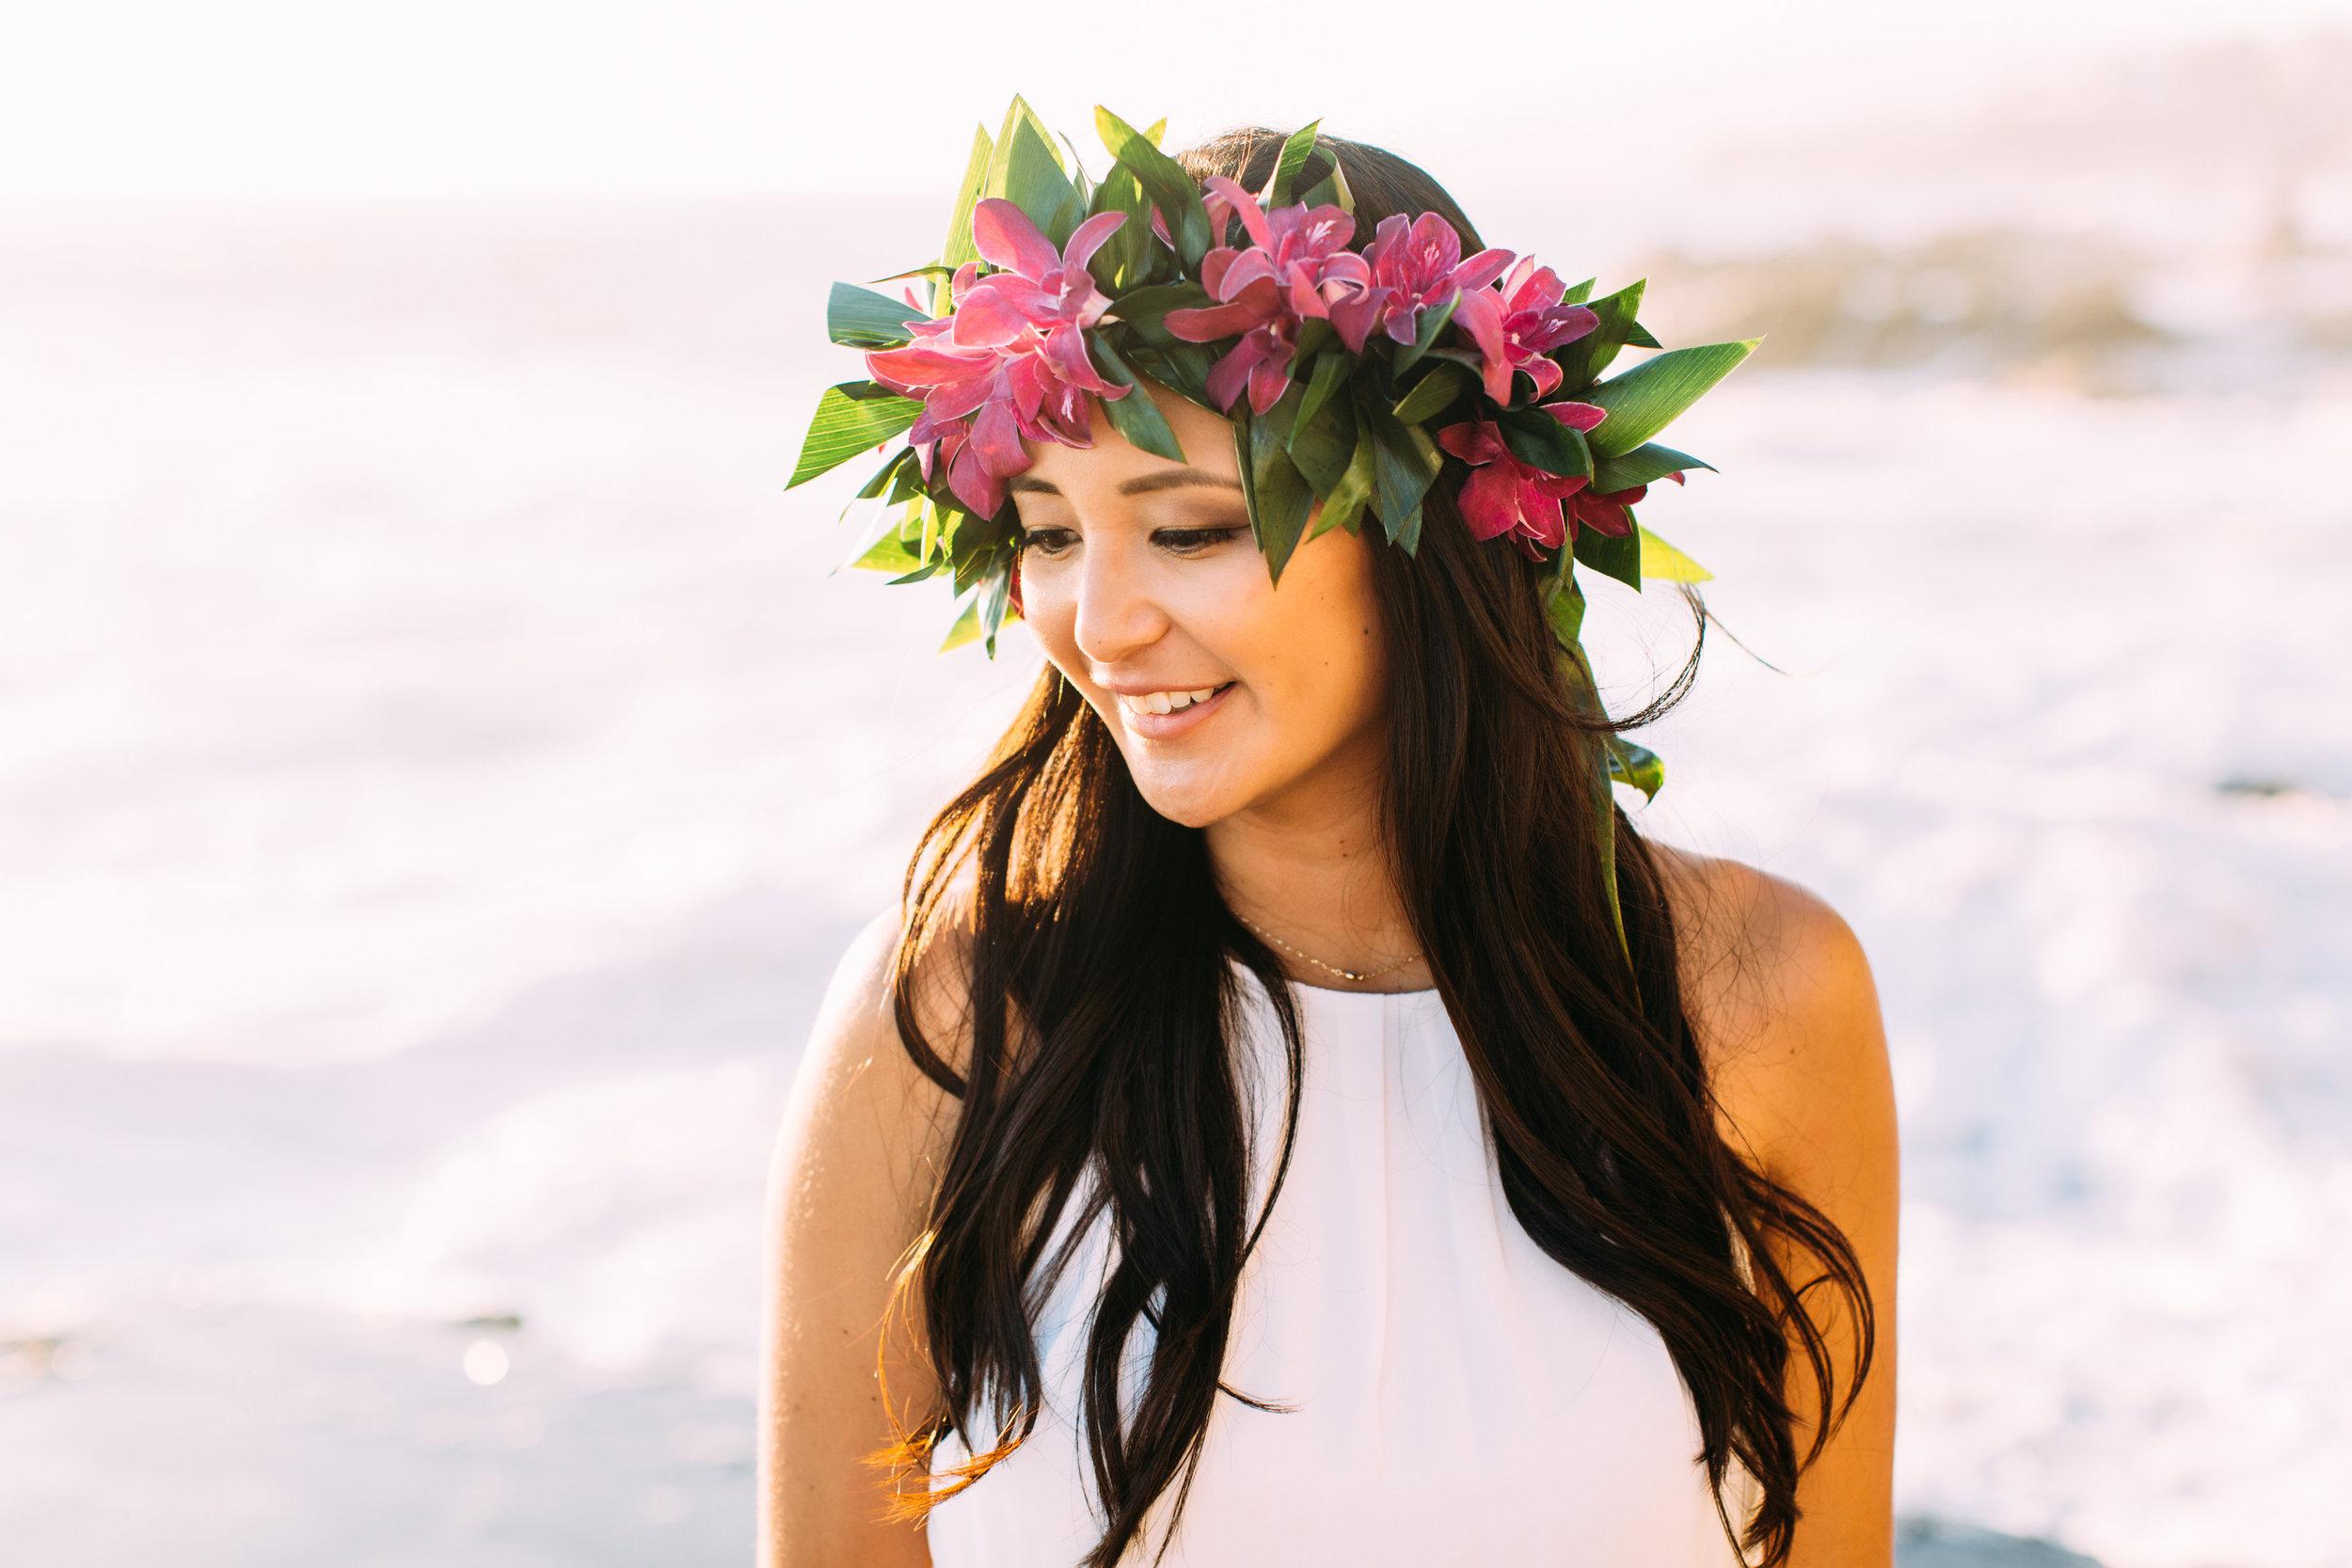 SanJuanCapistranoEngagementPhotos-LisaLeedy-Wedding Header.jpg